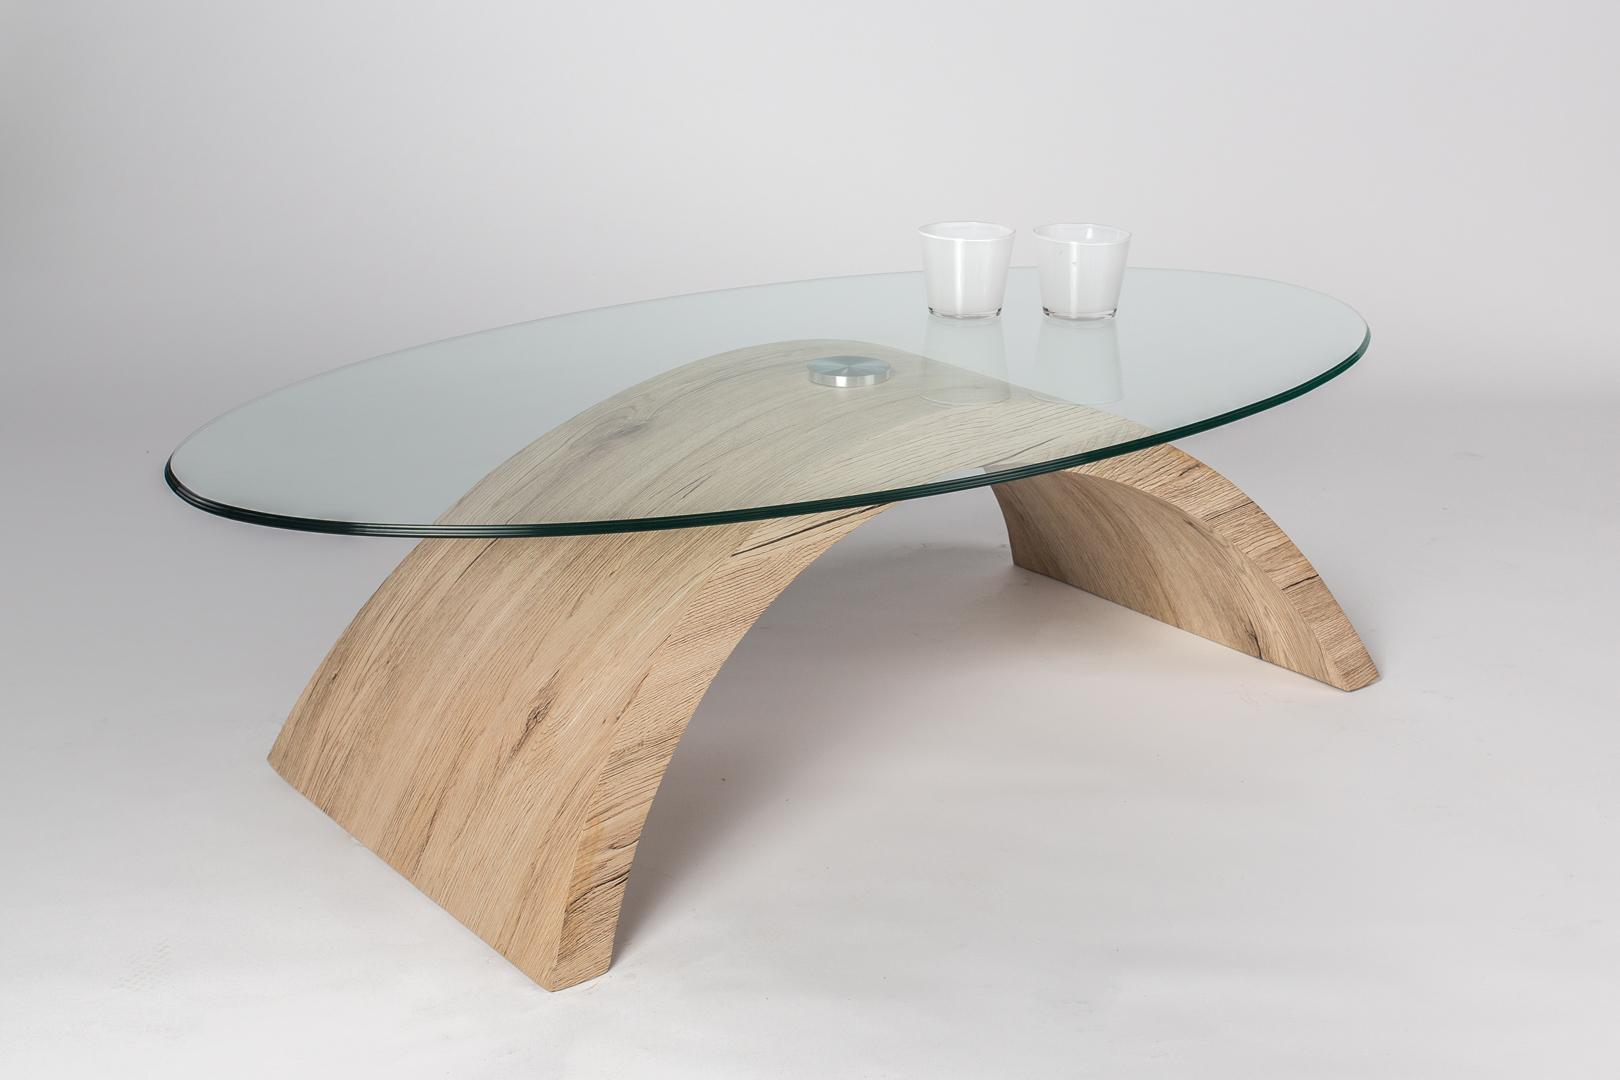 table basse design en verre et bois chene sable victorine